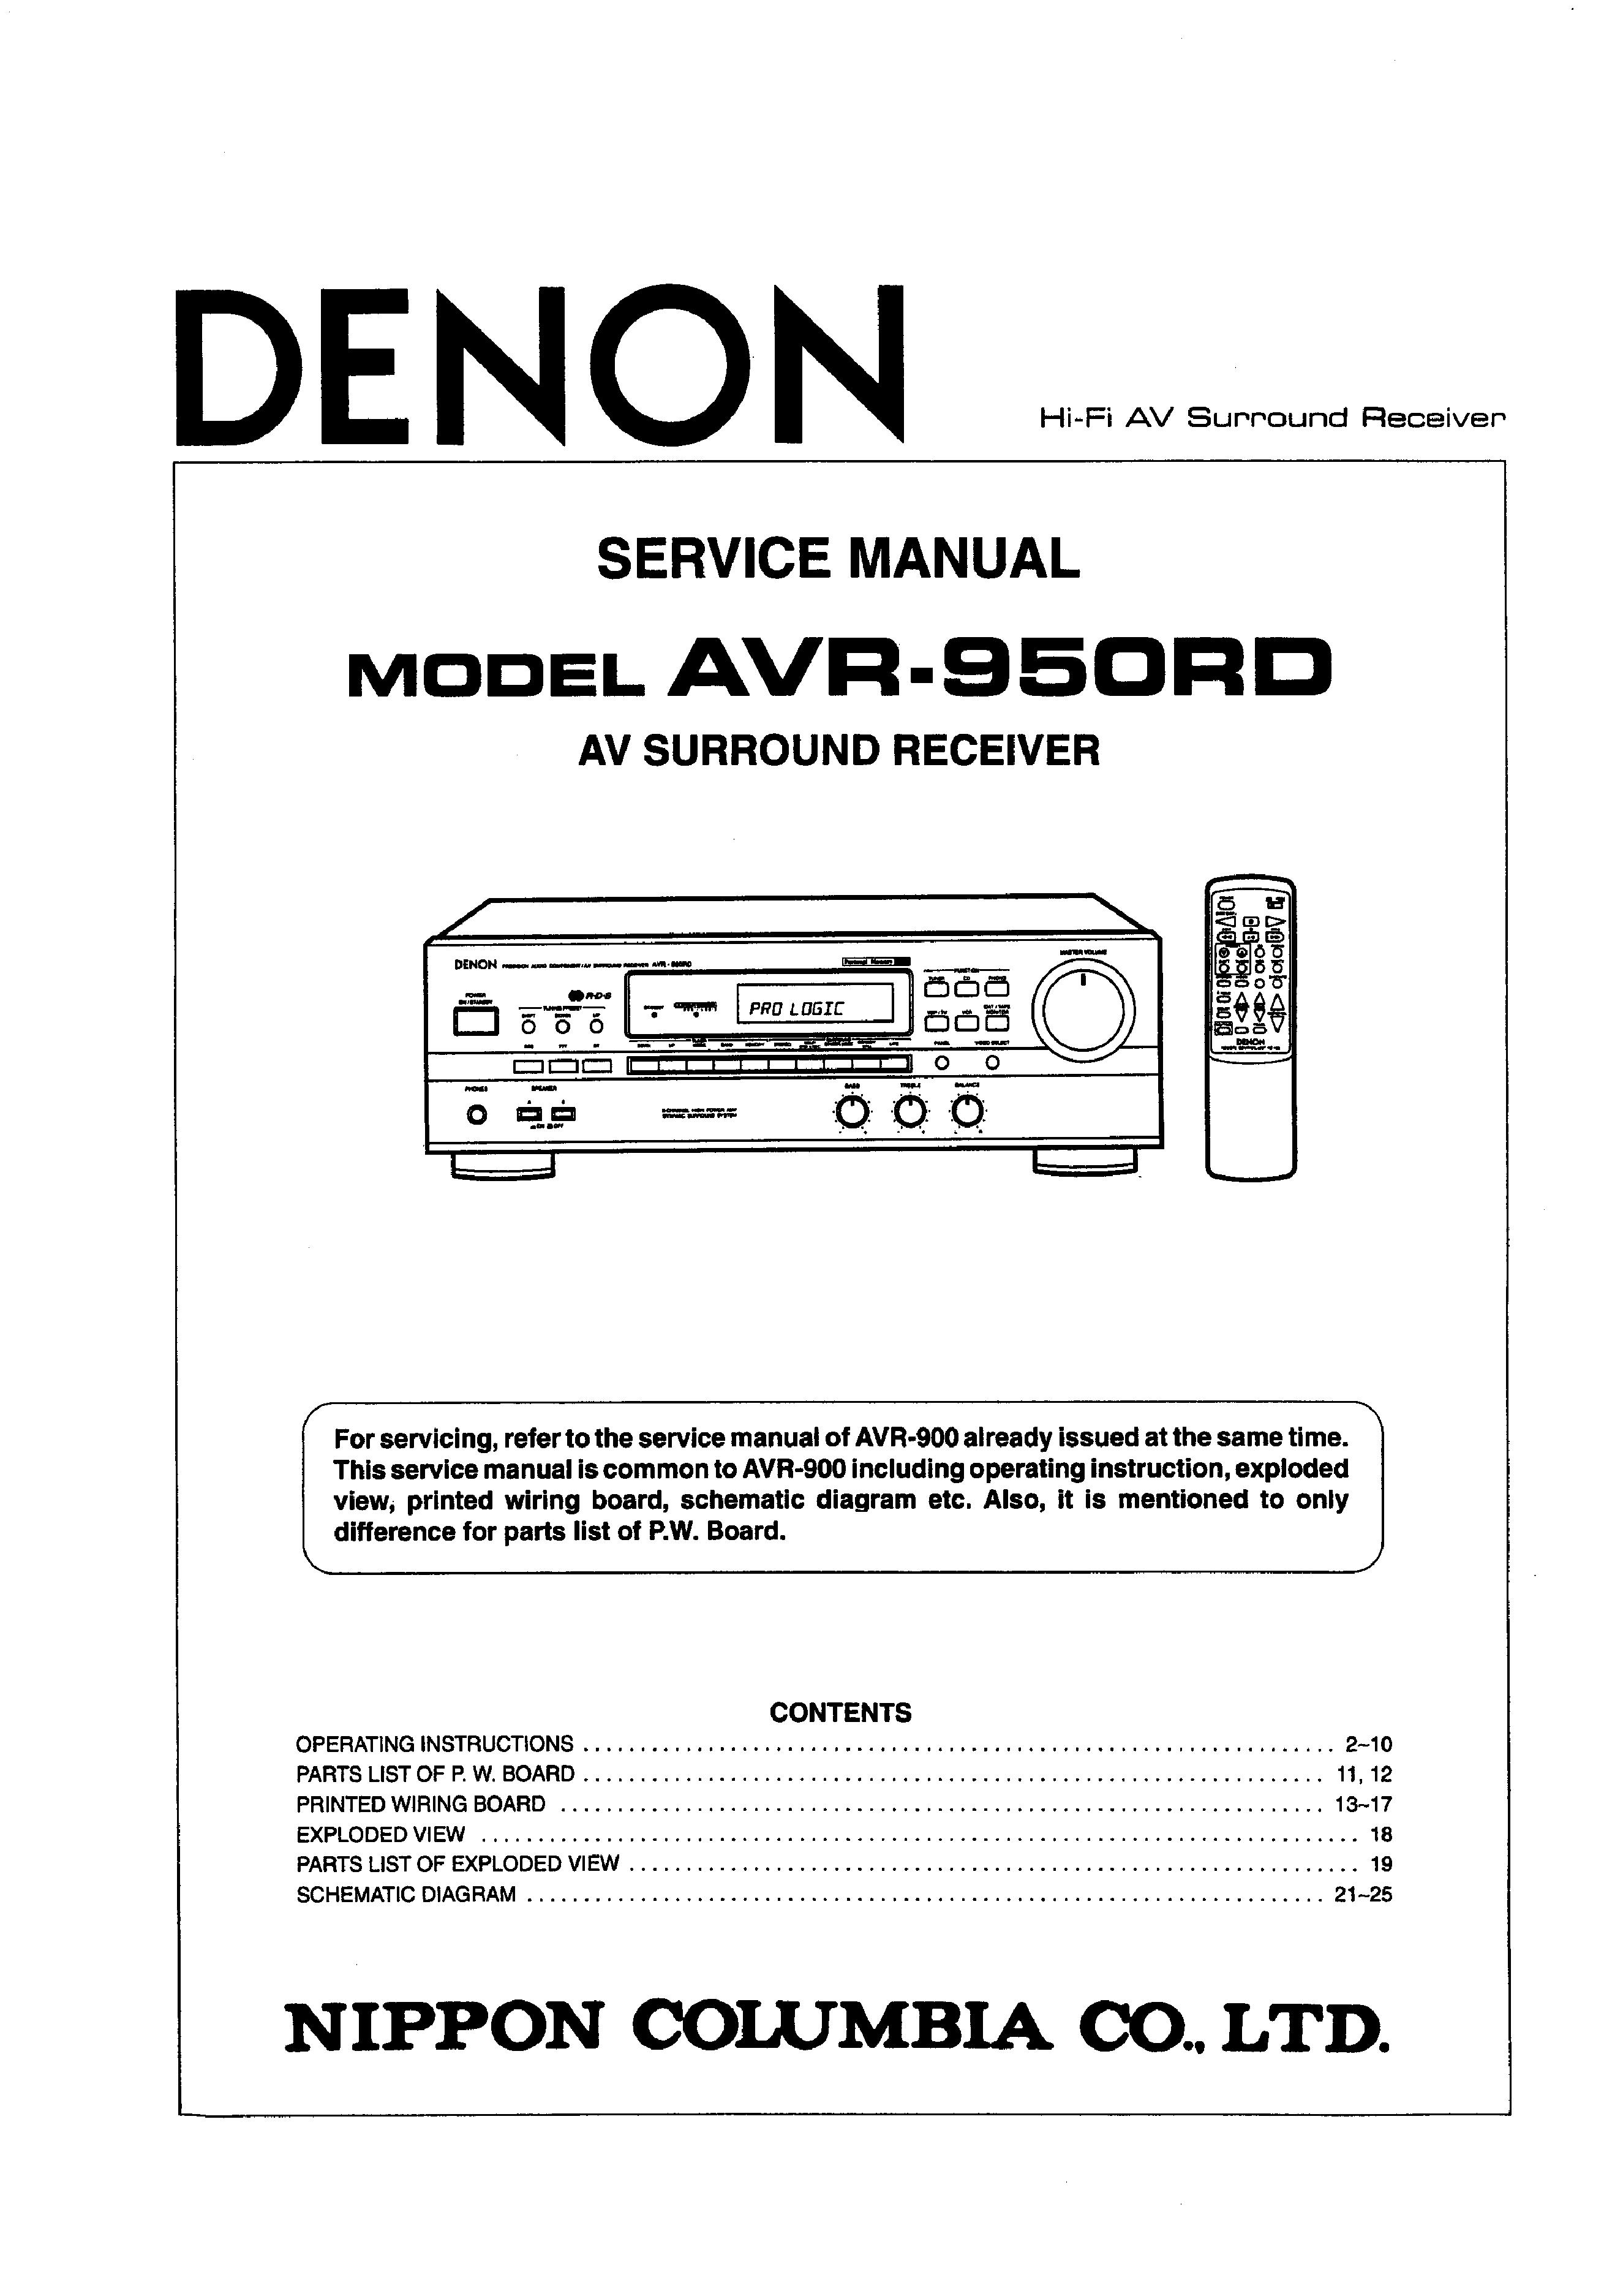 Service Manual For Denon Avr950rd